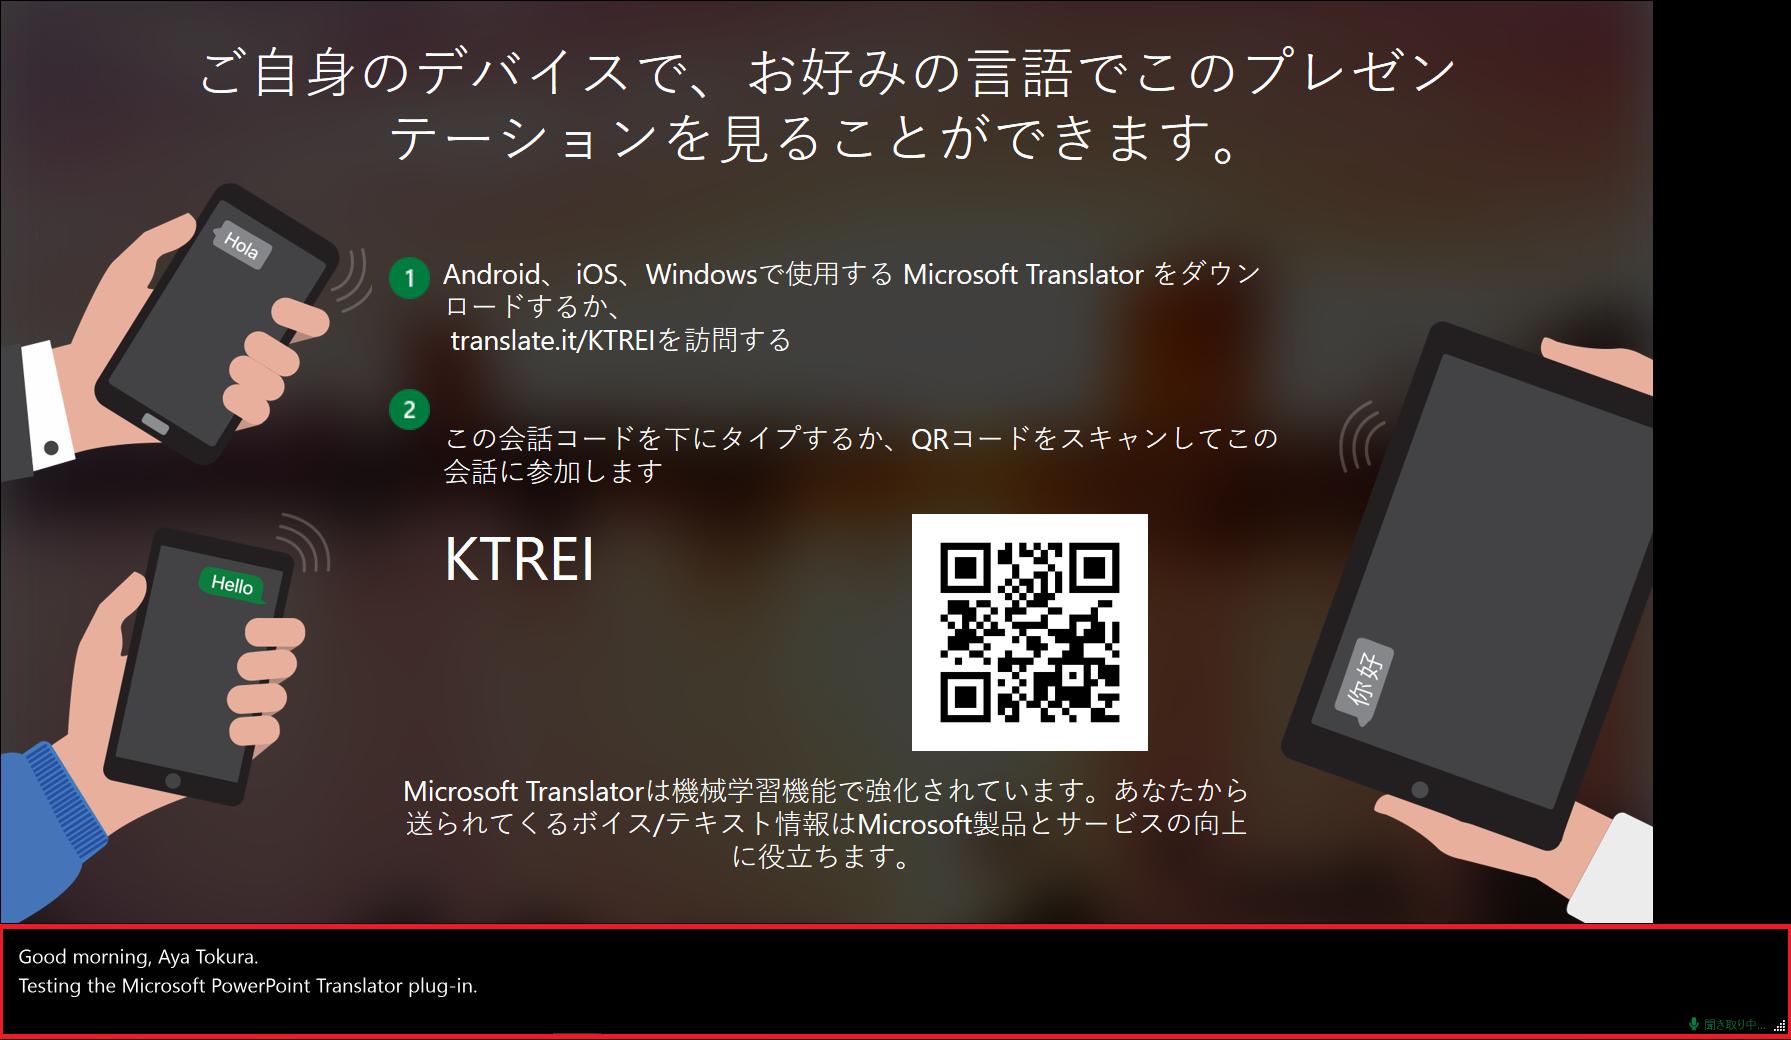 microsoft translator powerpointでリアルタイム音声翻訳機能を追加し